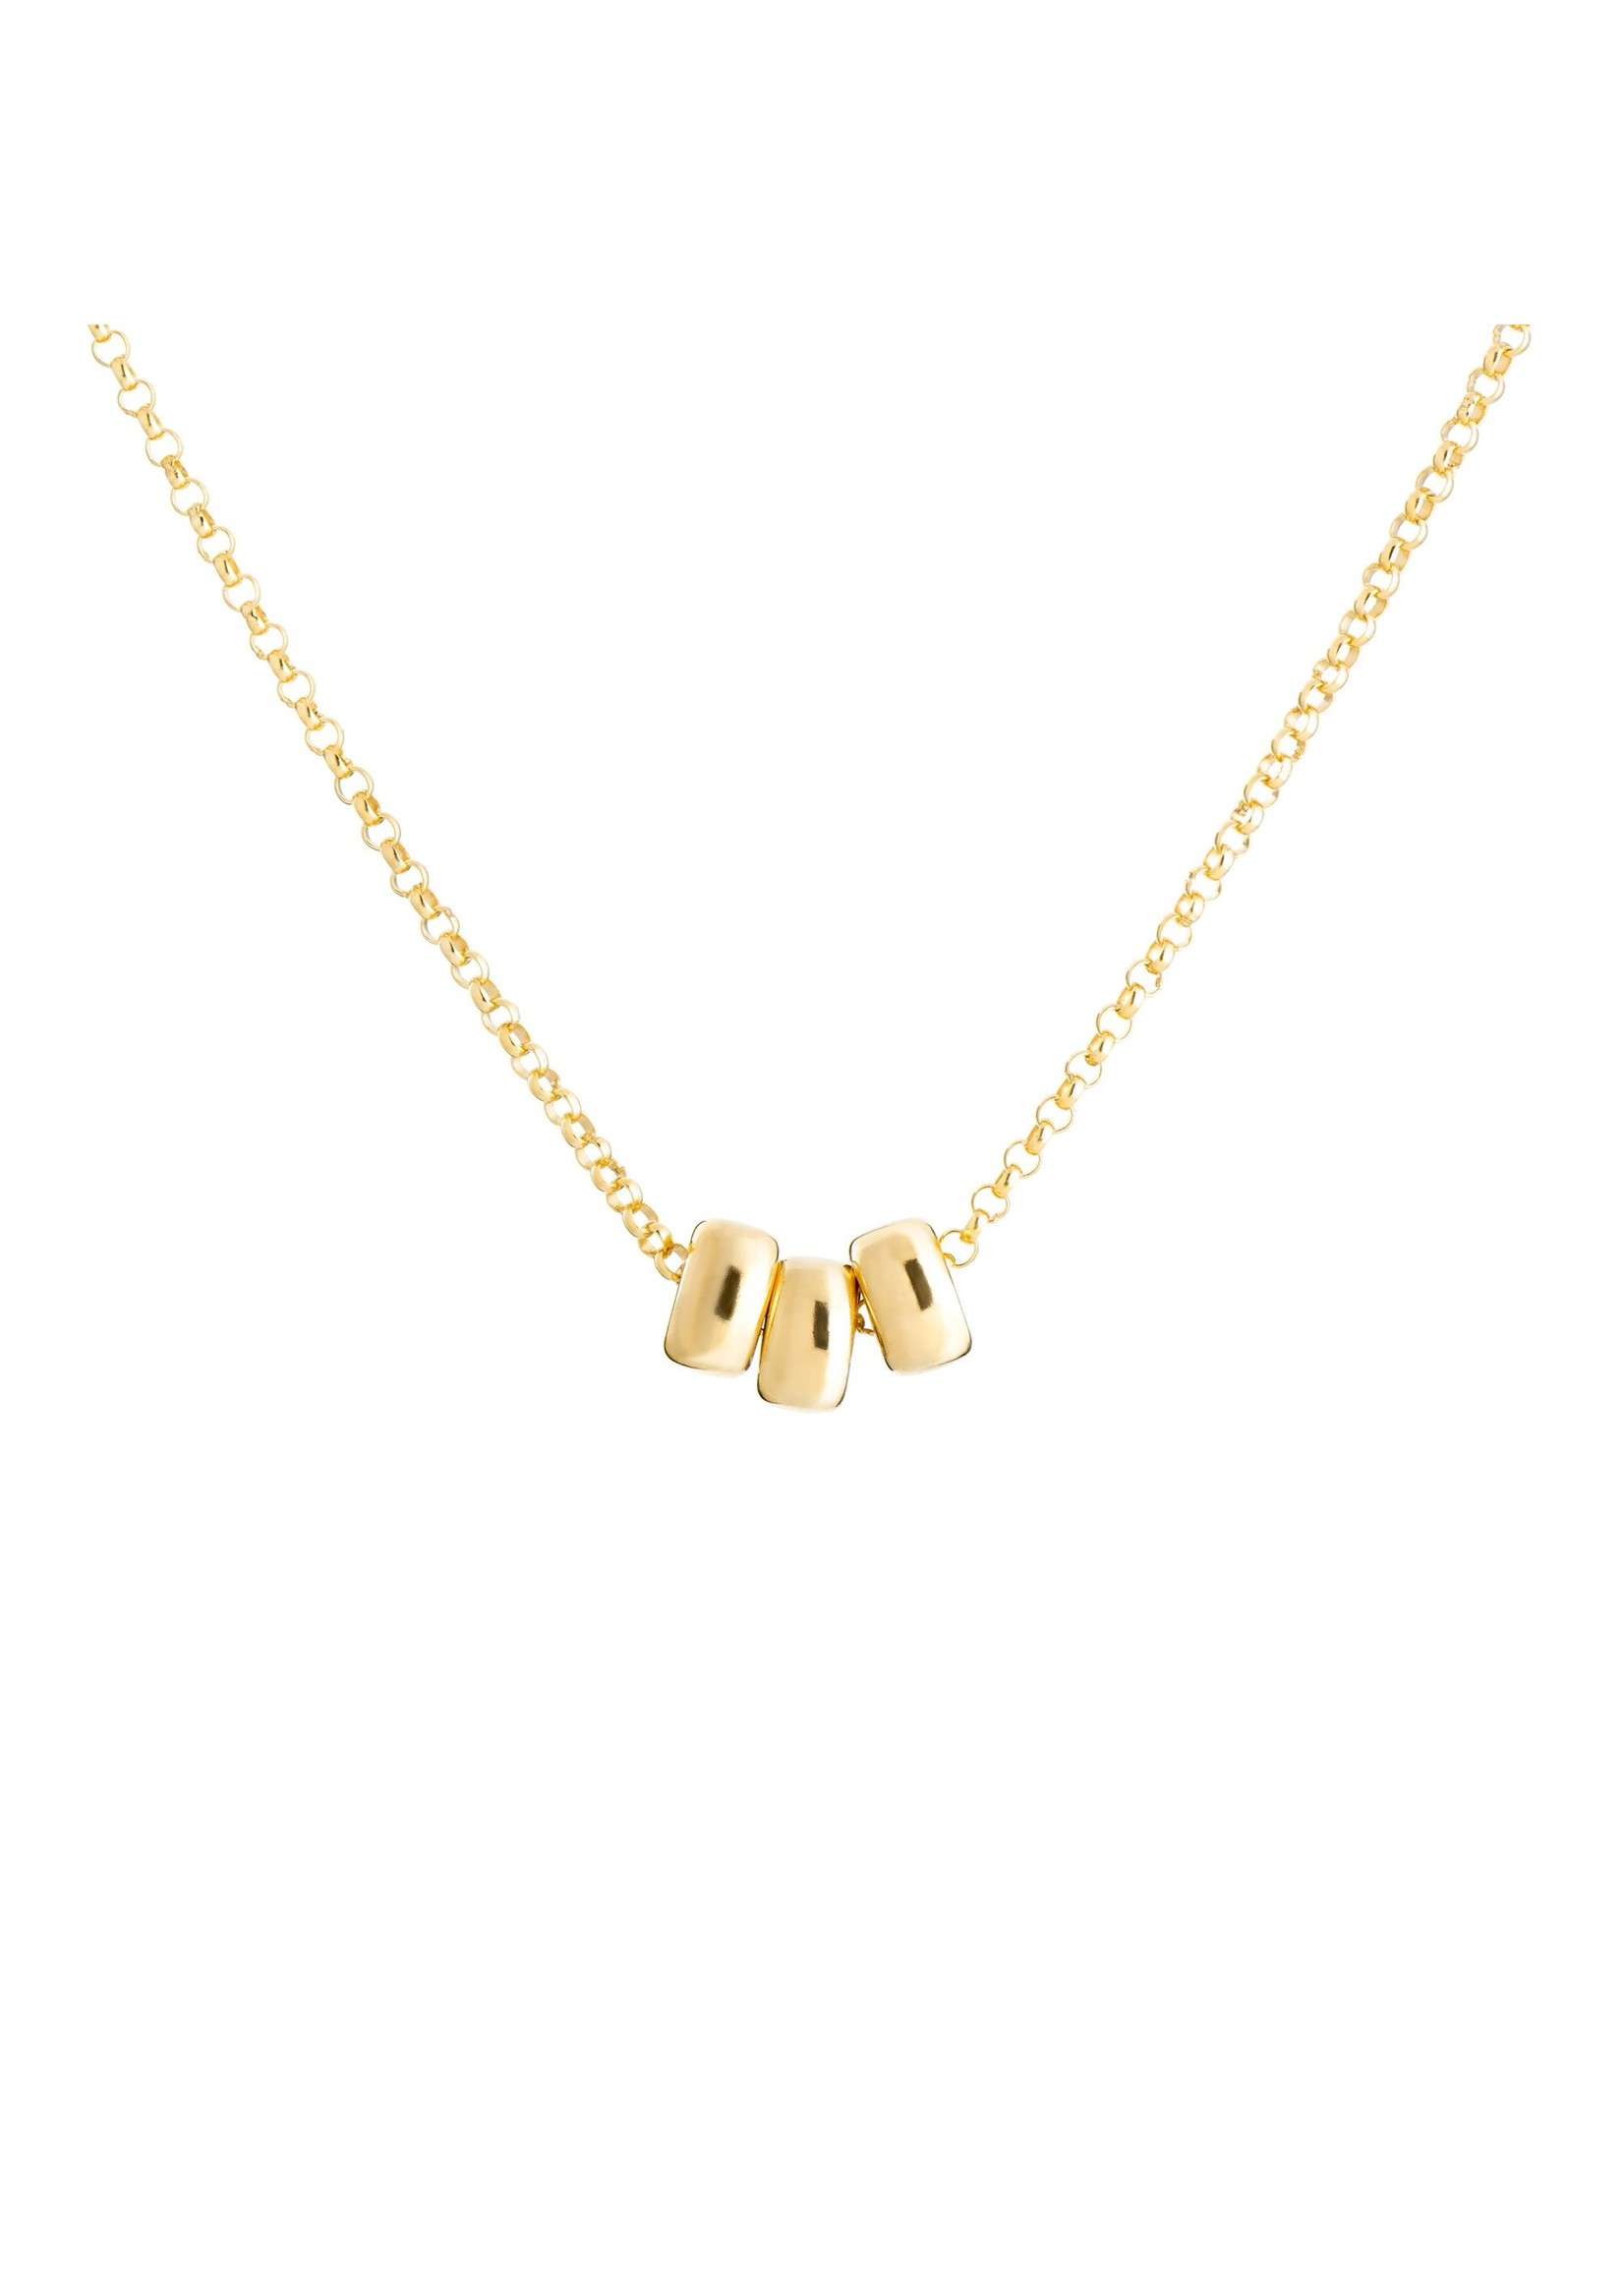 Lolo Jewellery Trio 6mm Rondell - Gold